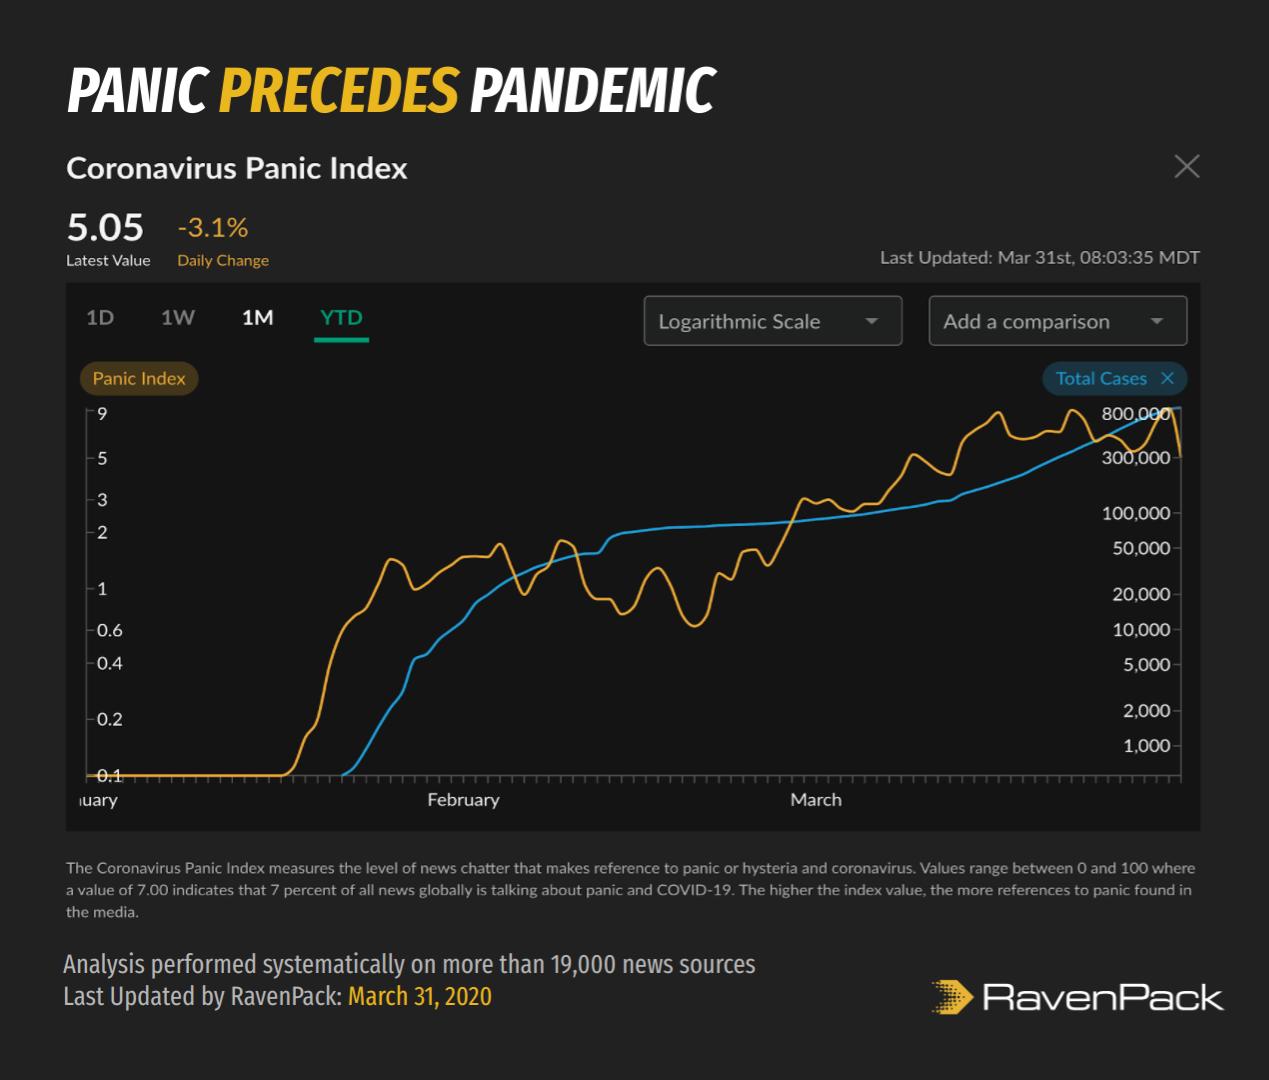 Panic Index Leads Coronavirus Cases